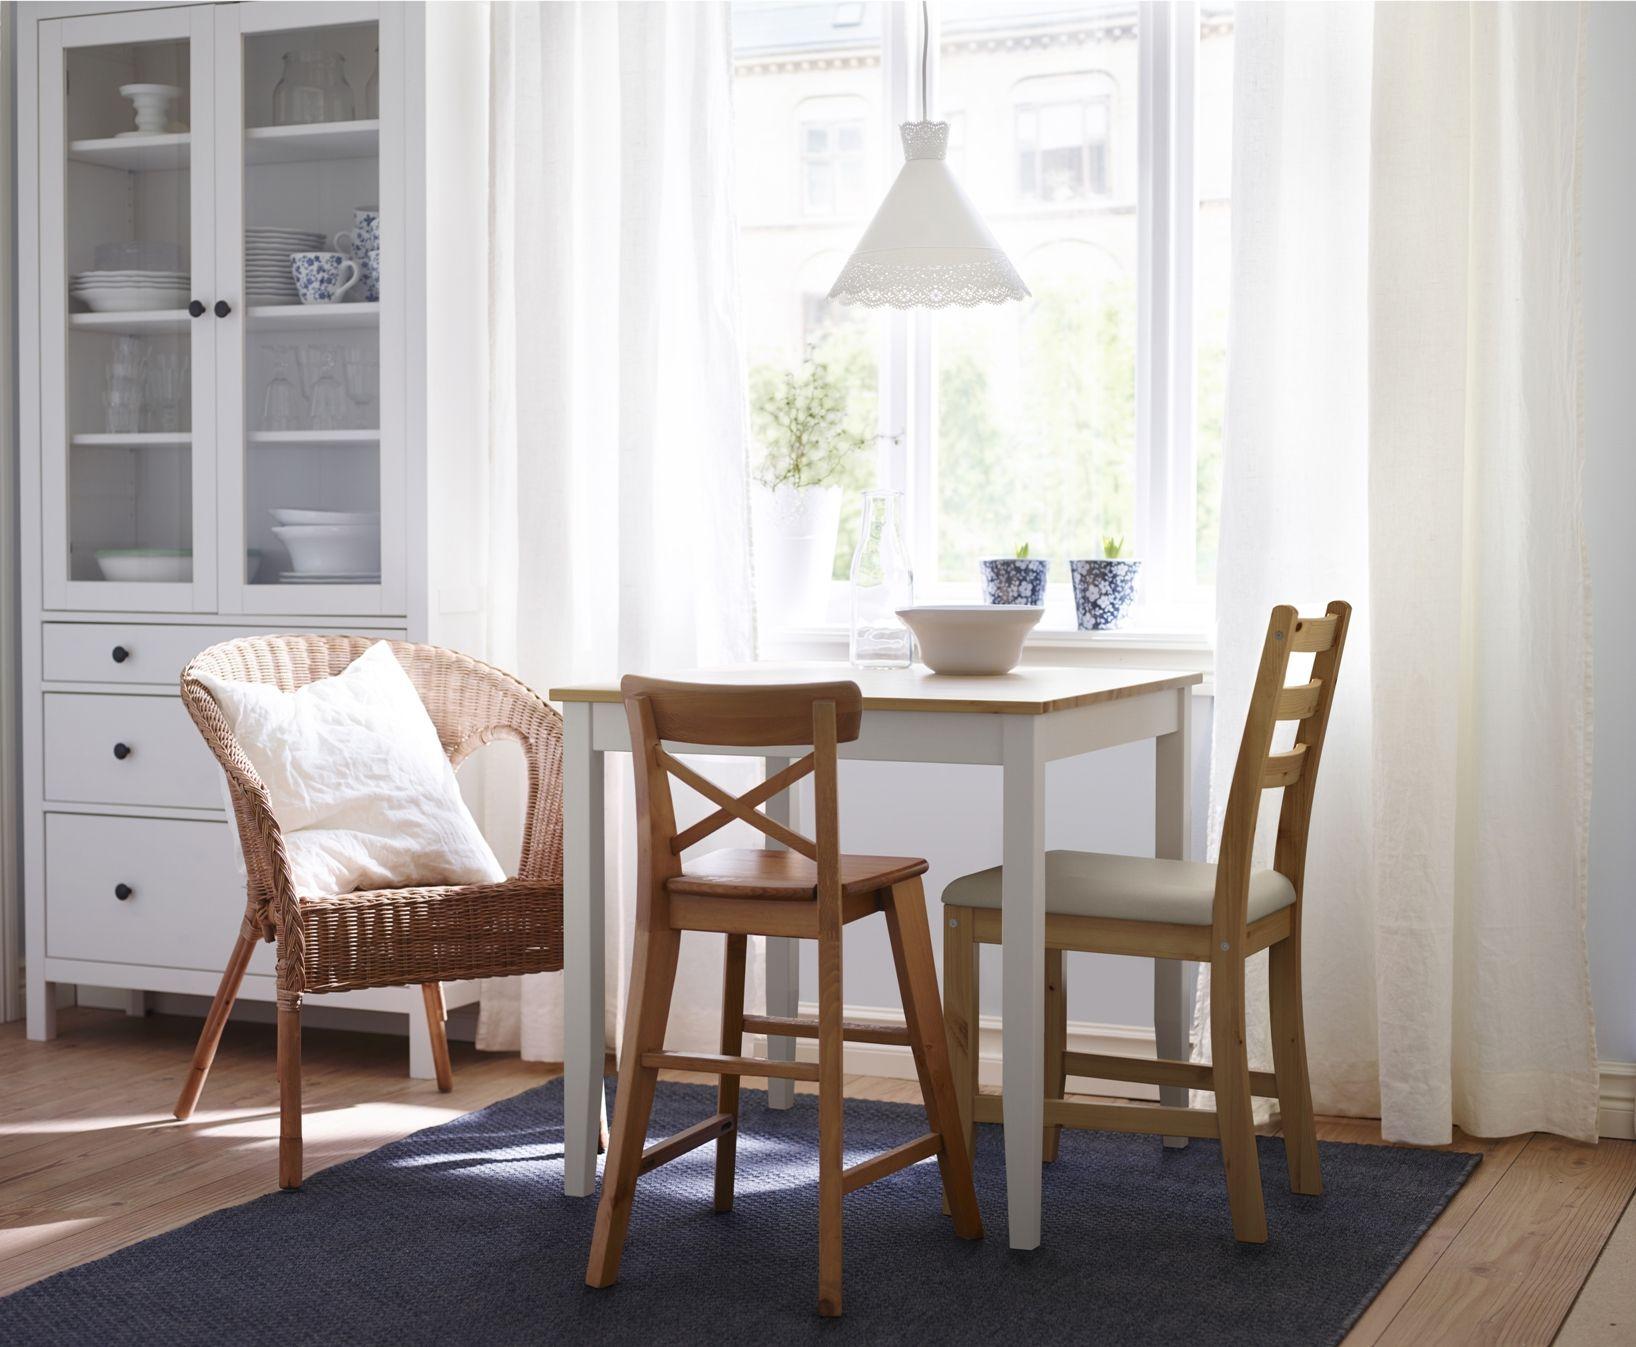 Lerhamn Table Light Antique Stain White Stain Kitchen